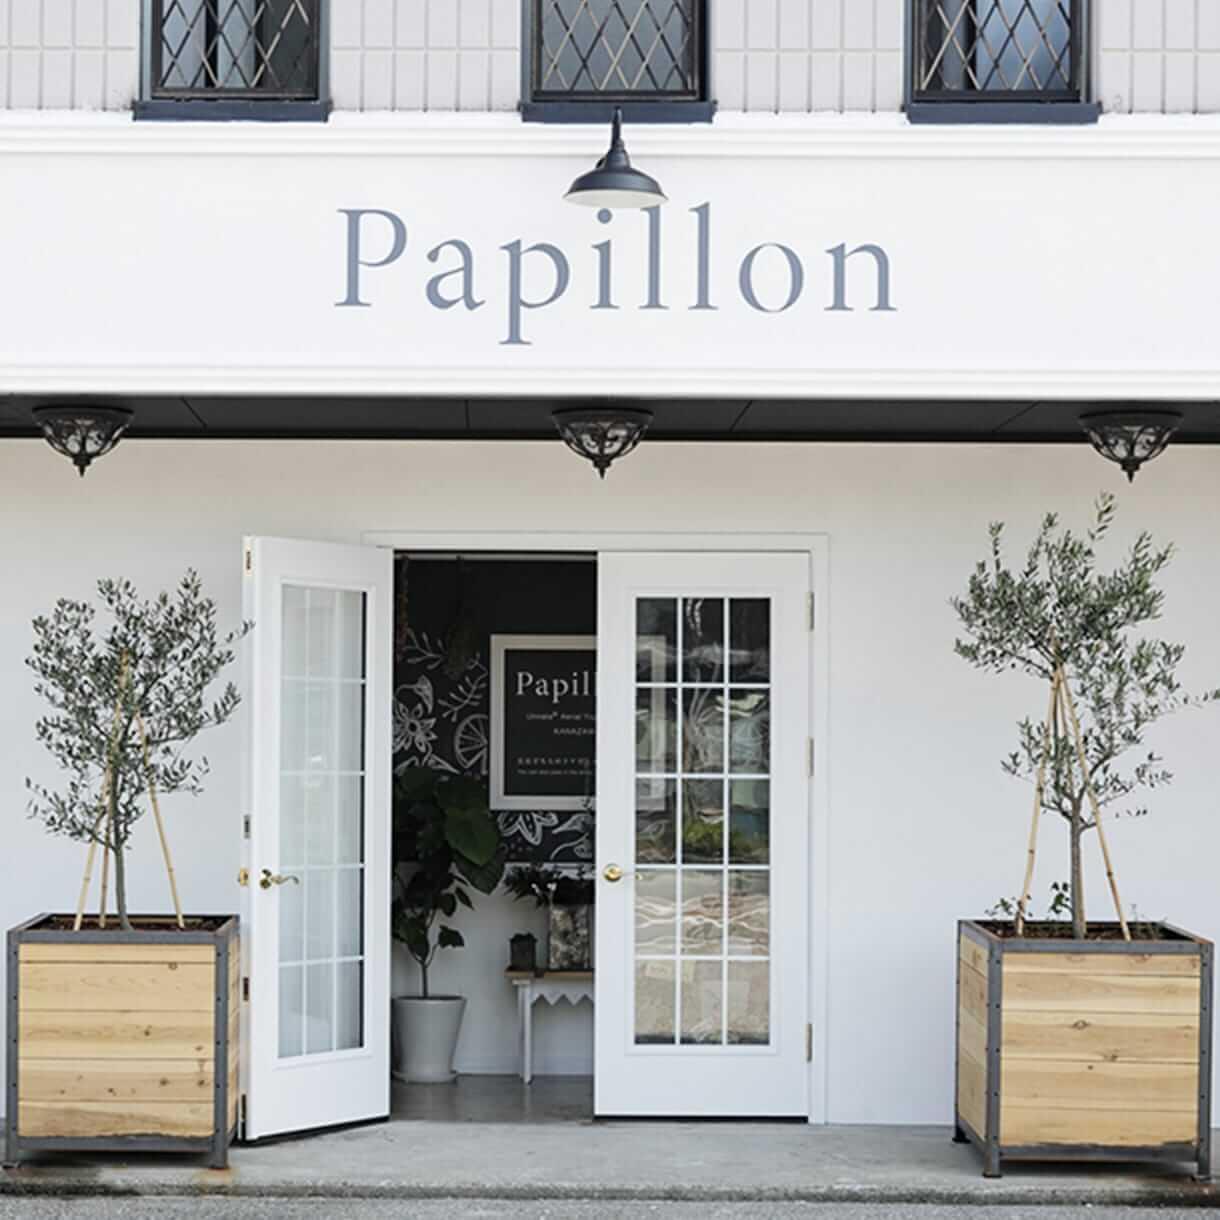 Papillonのスタジオ外観画像